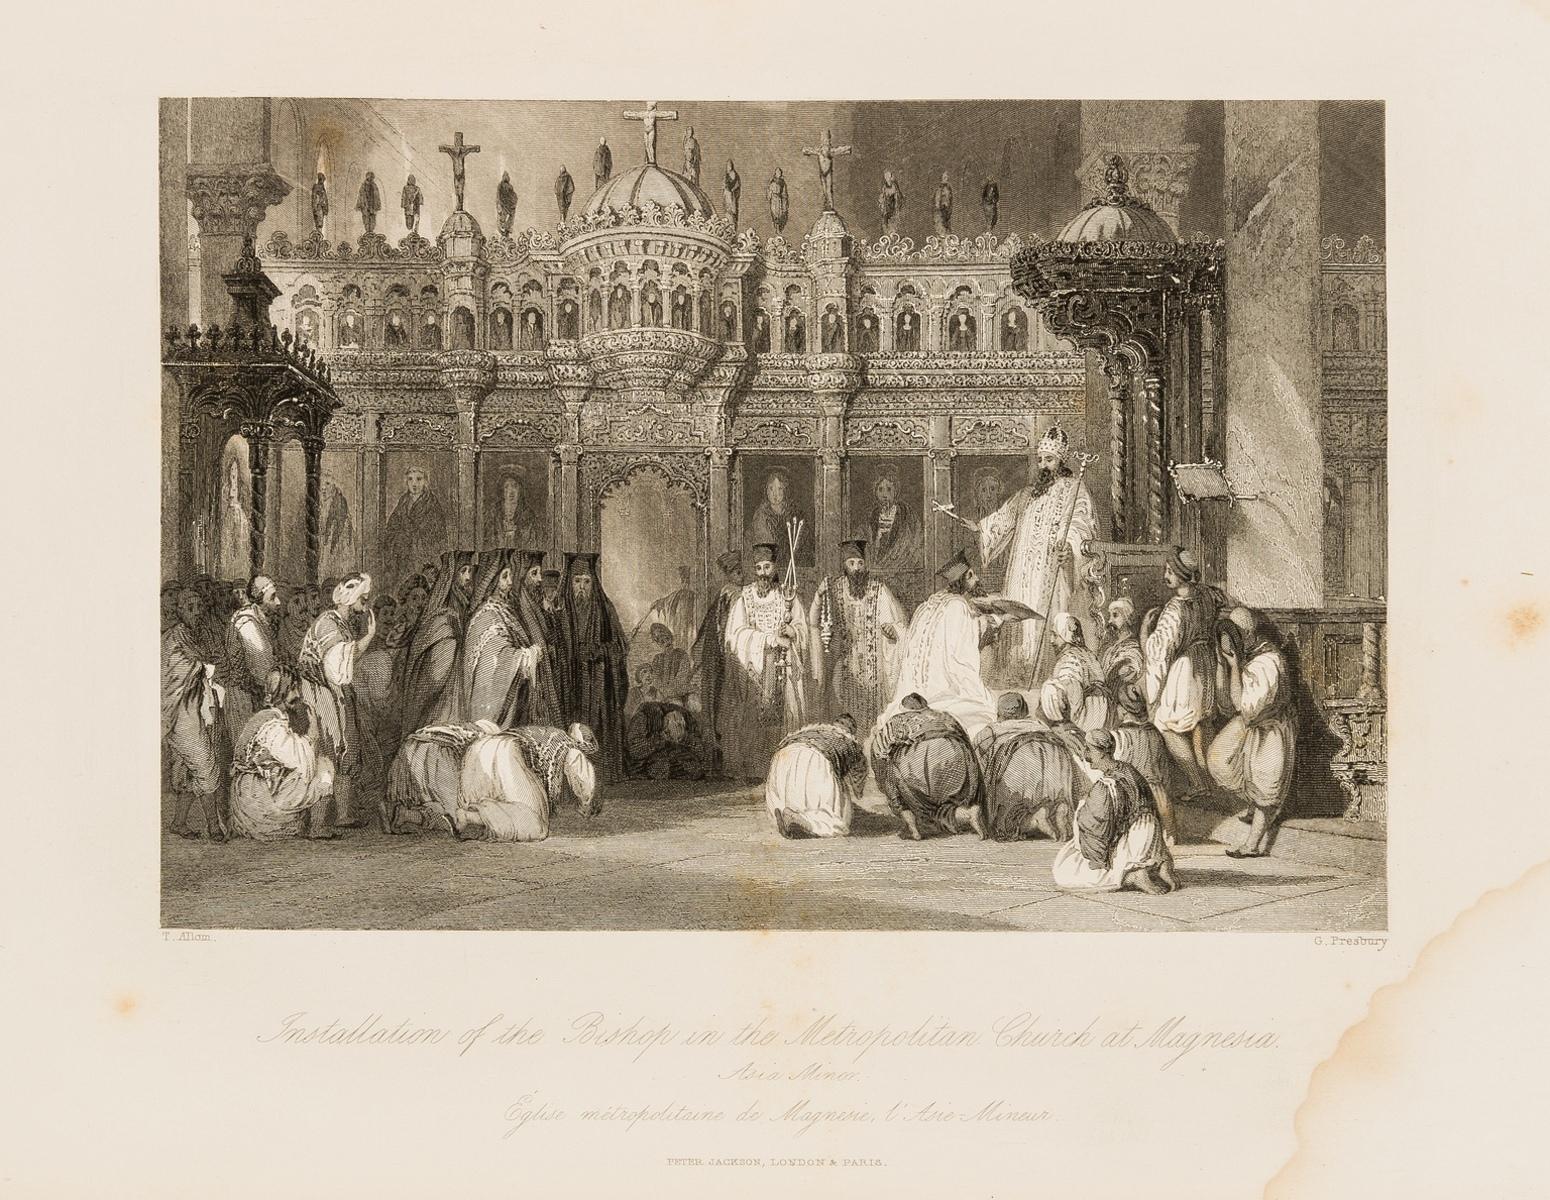 Turkey.- Allom (Thomas) The Turkish Empire Illustrated. Fisher's Illustrations of Constantinople …